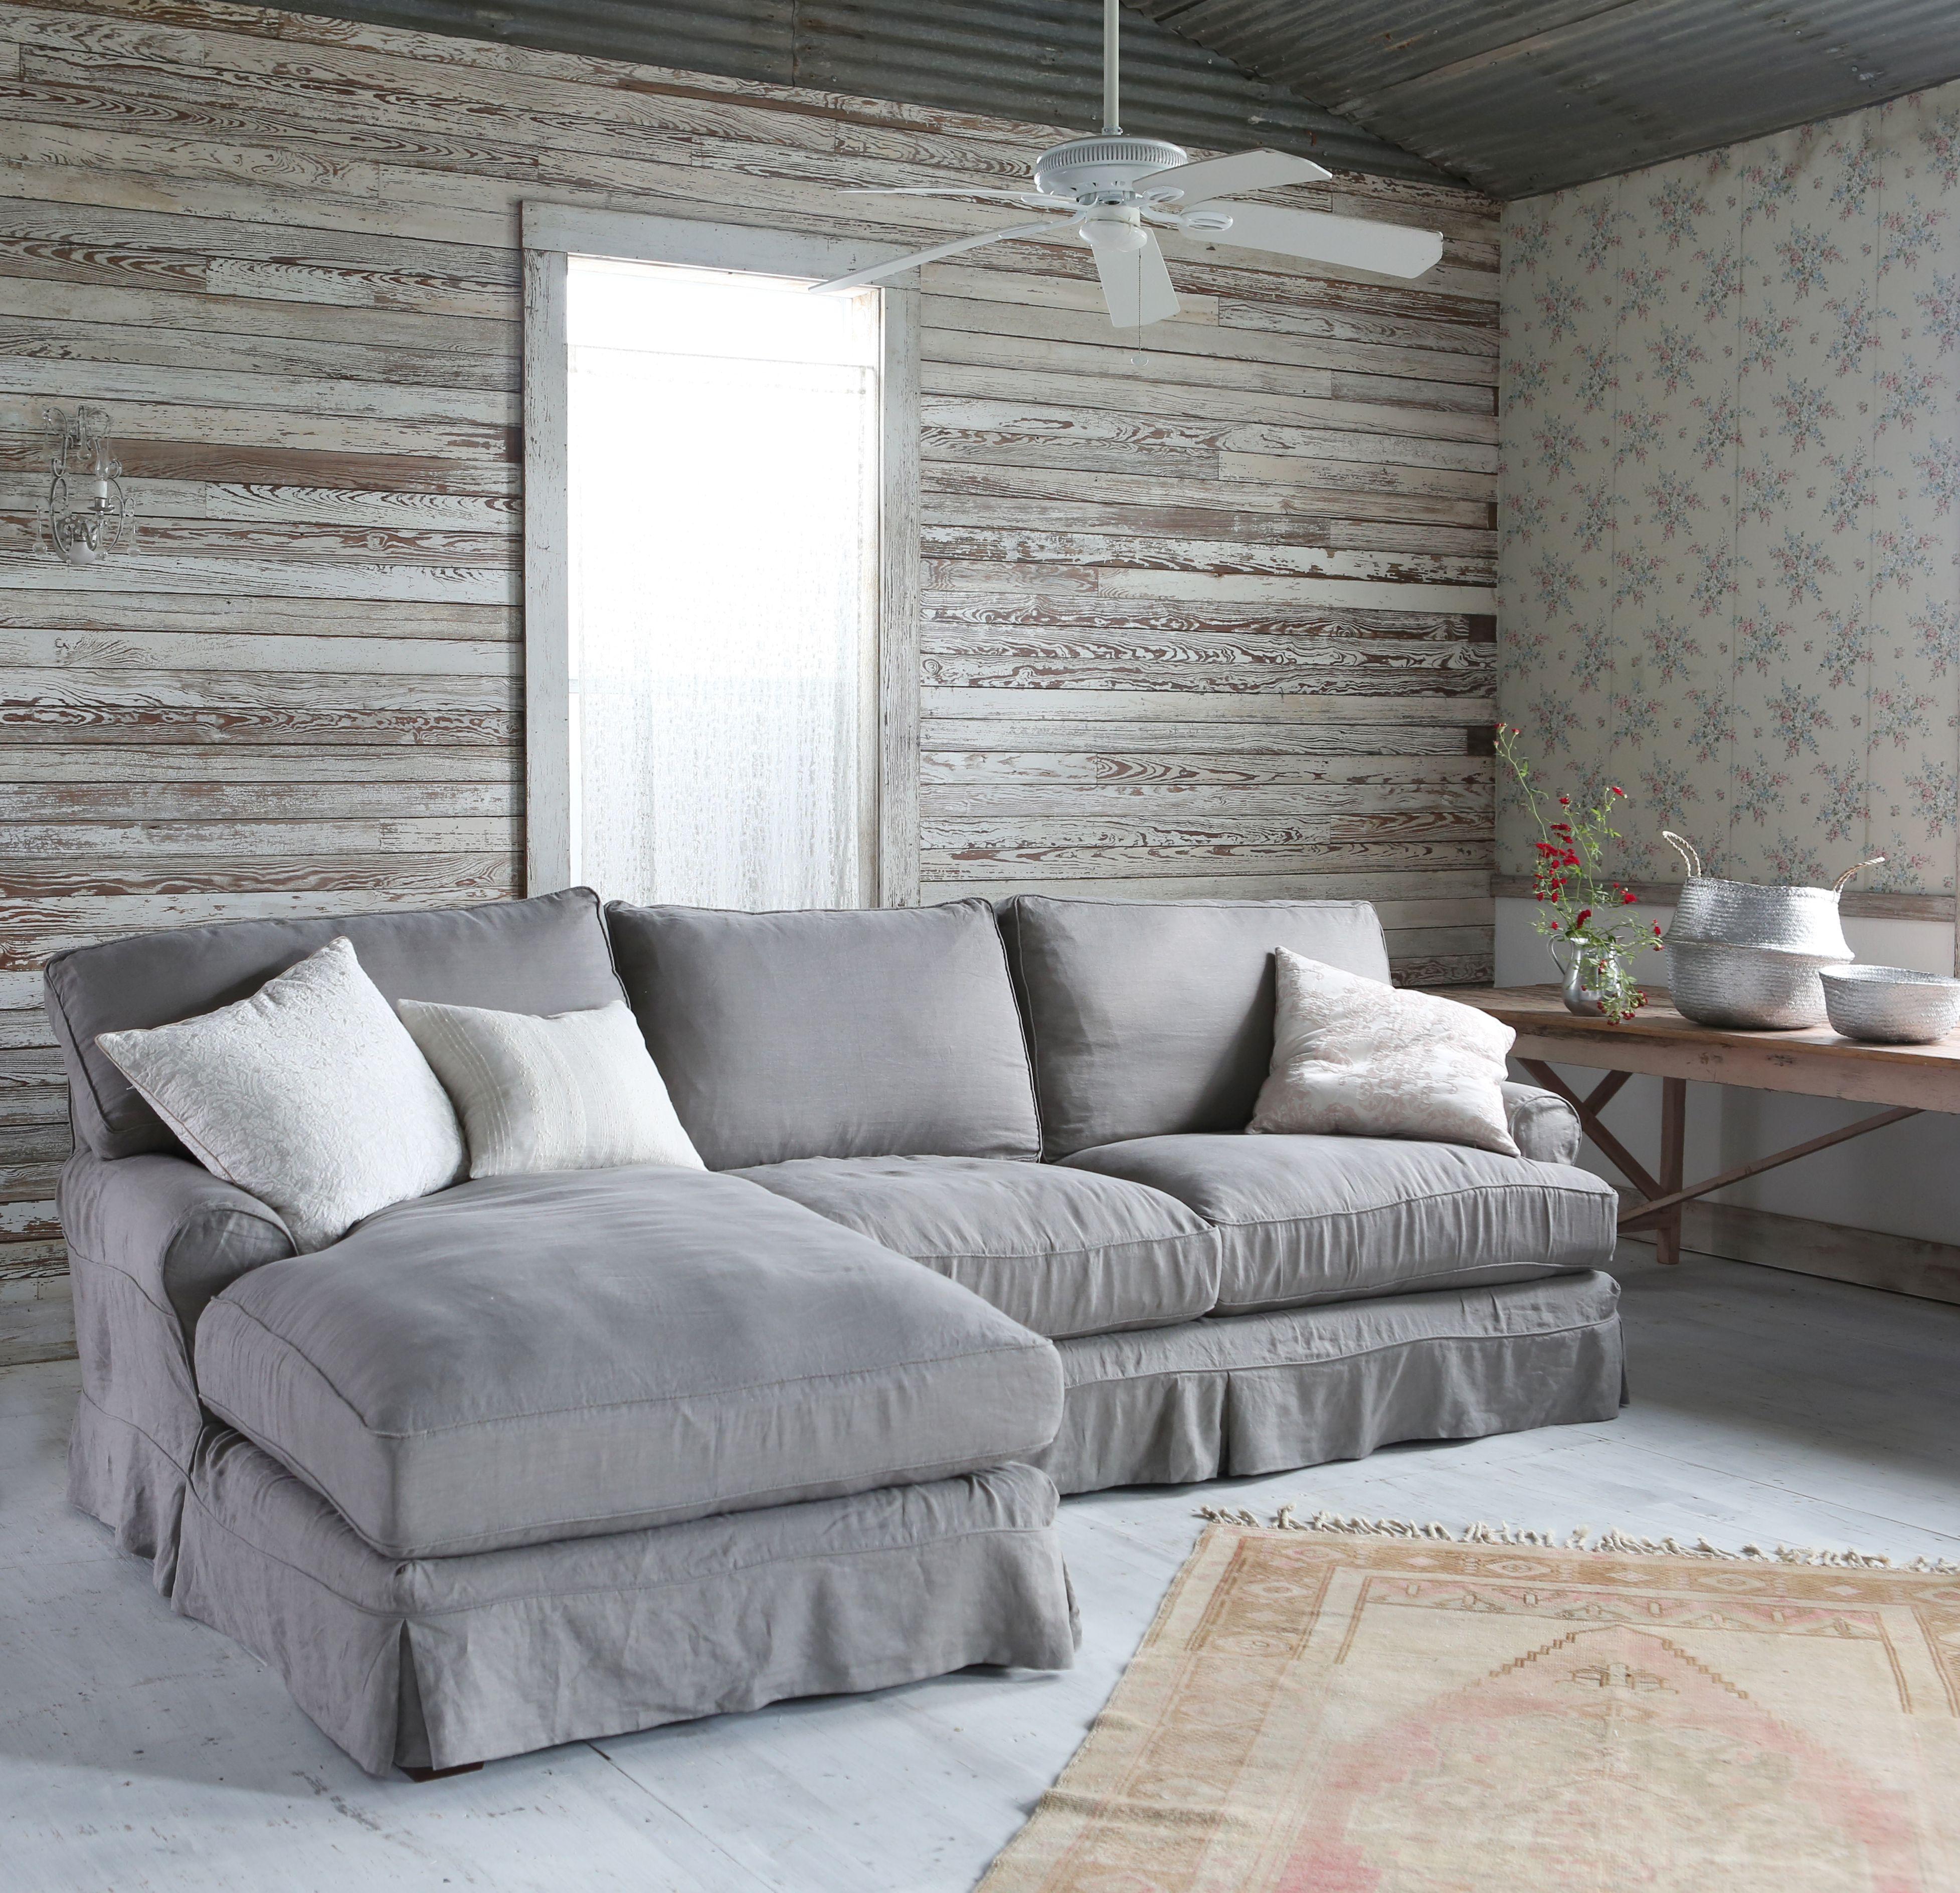 Squishy Sectional Sofa Shabby Chic Furniture Comfy Sofa Shabby